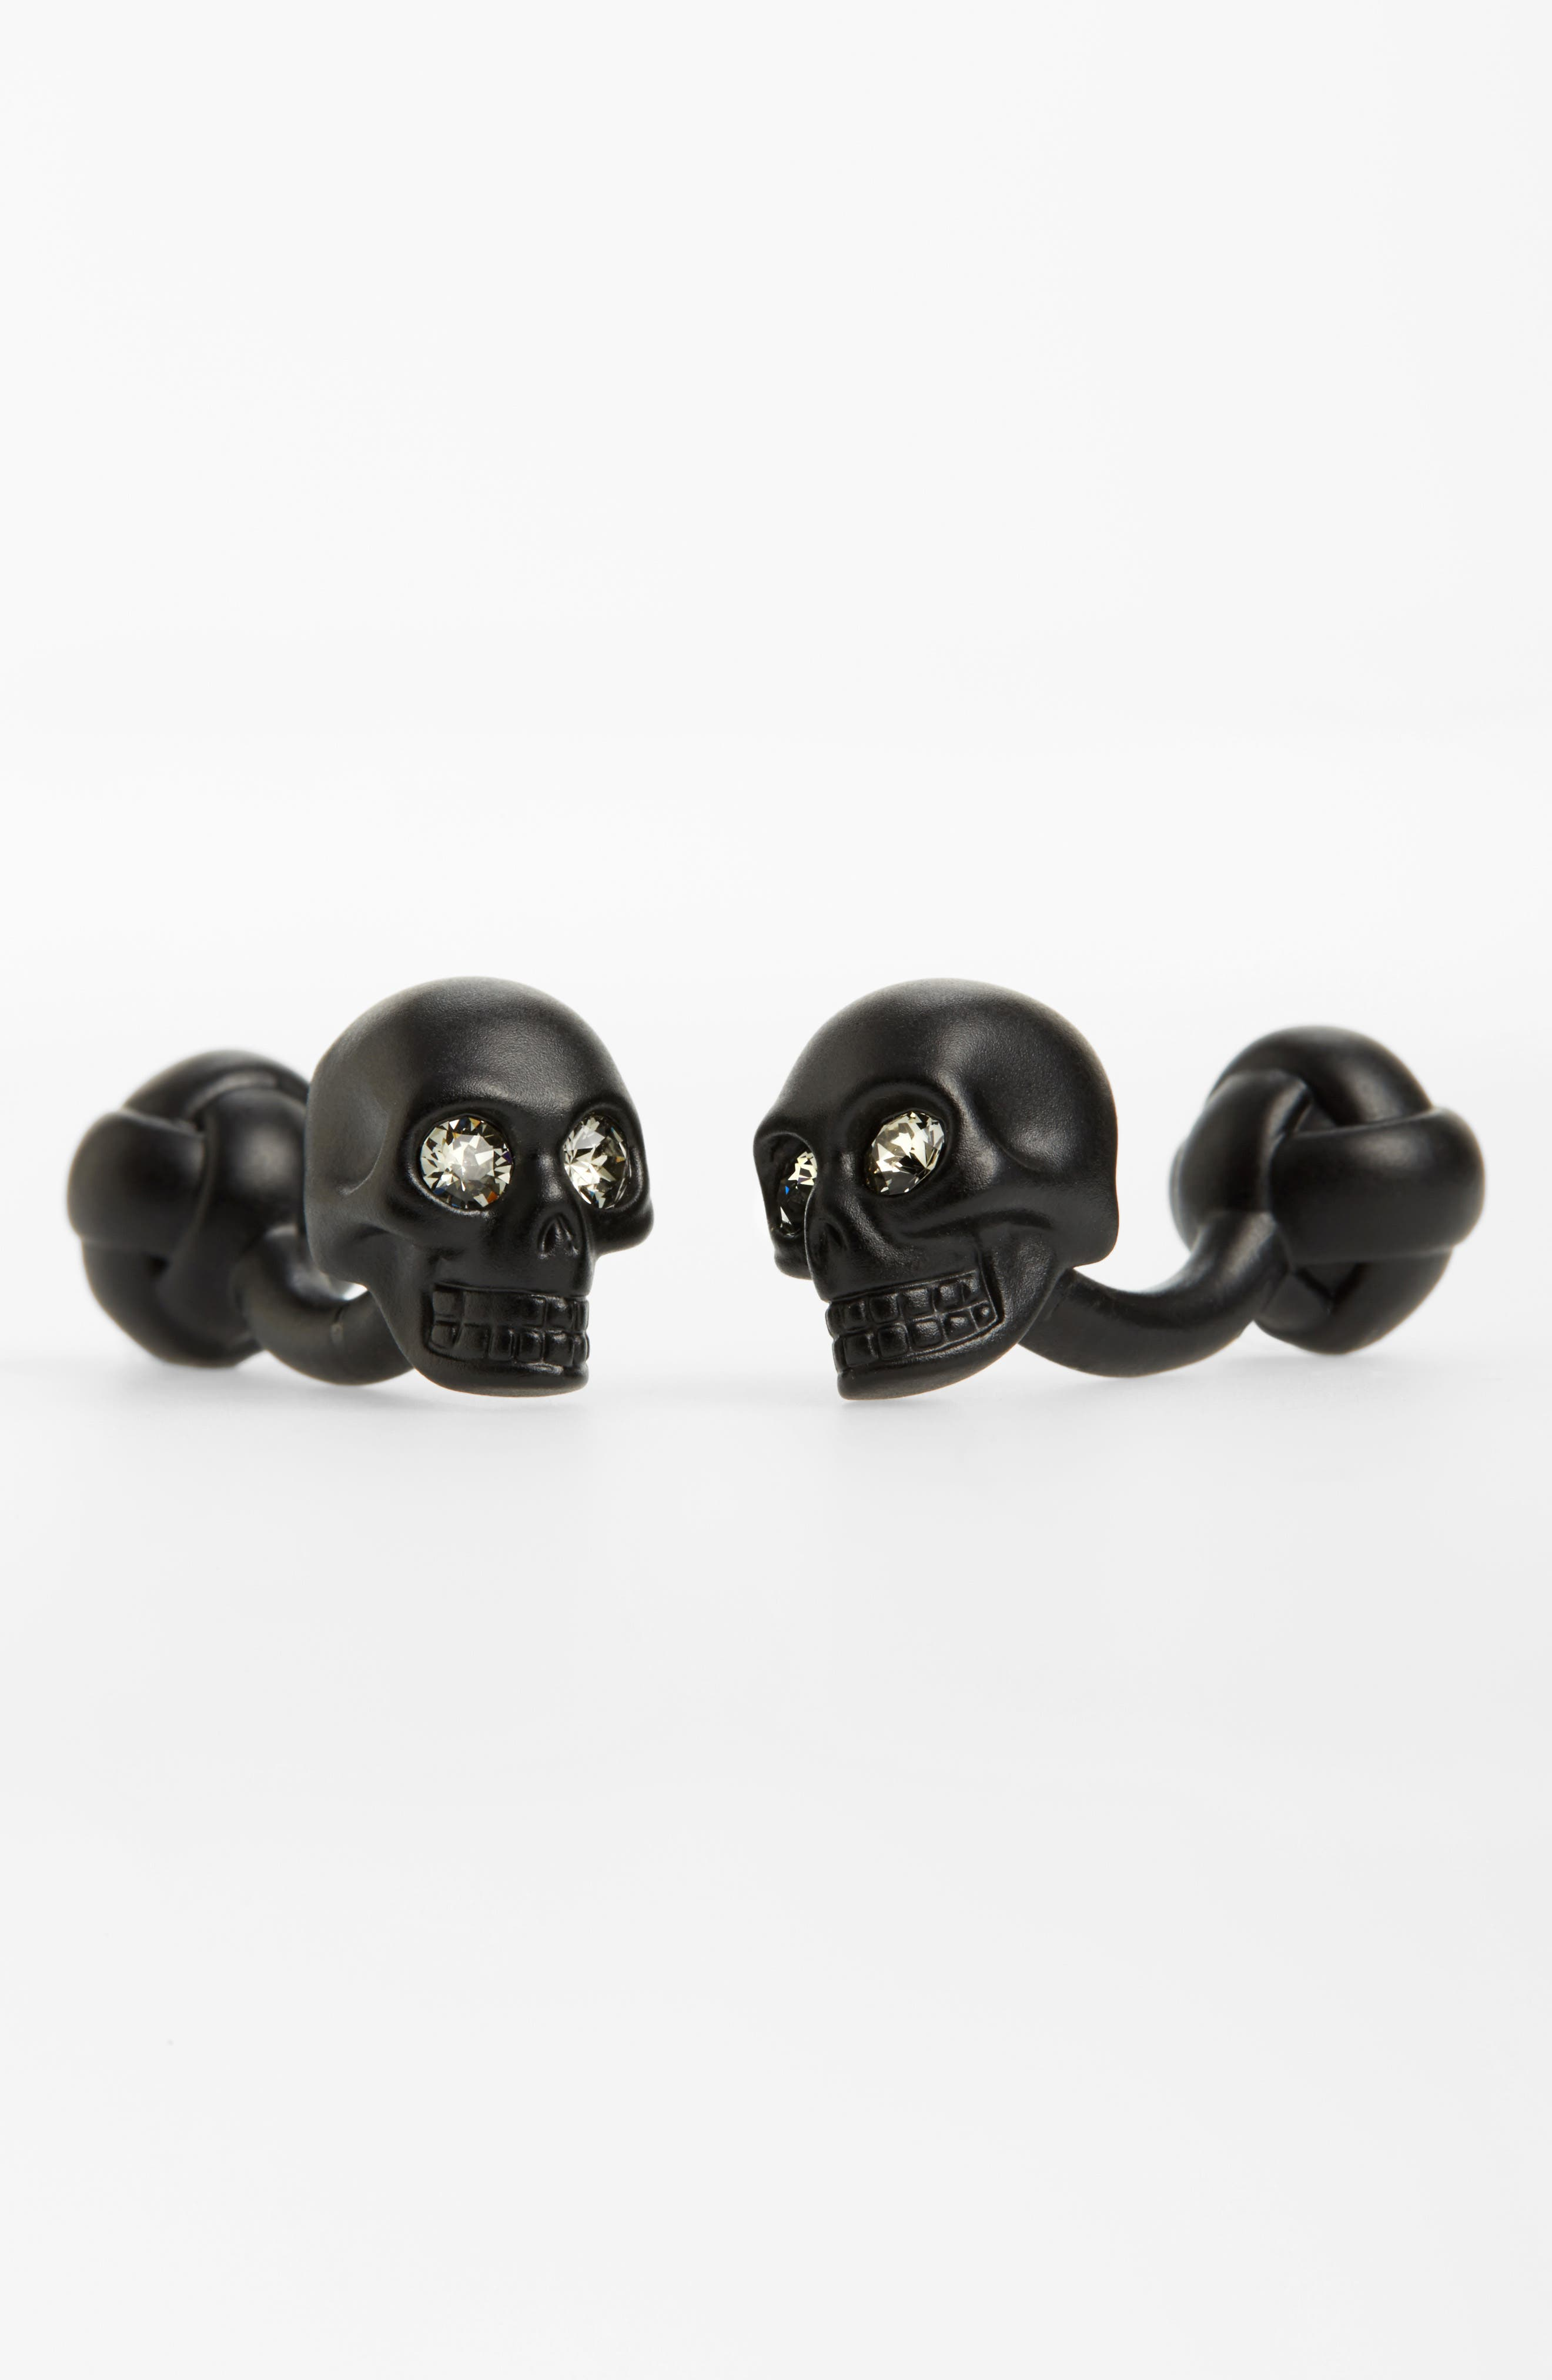 3D Skull Matte Brass Cuff Links,                             Main thumbnail 1, color,                             Black/ Crystal